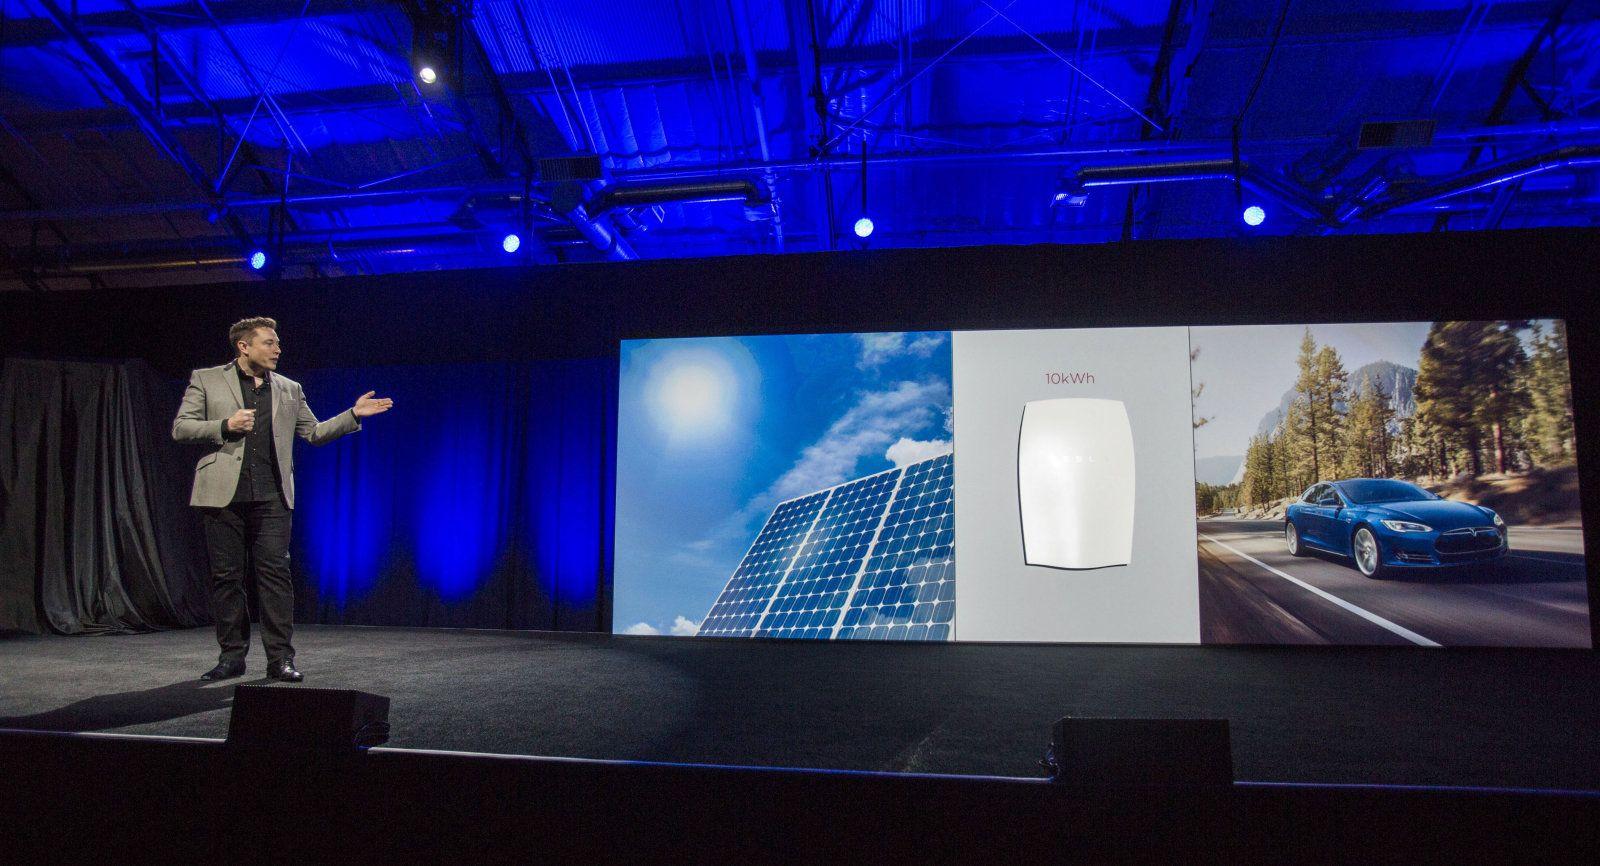 Elon Musks Companies Team Up Tesla Offers To Buy Solar City